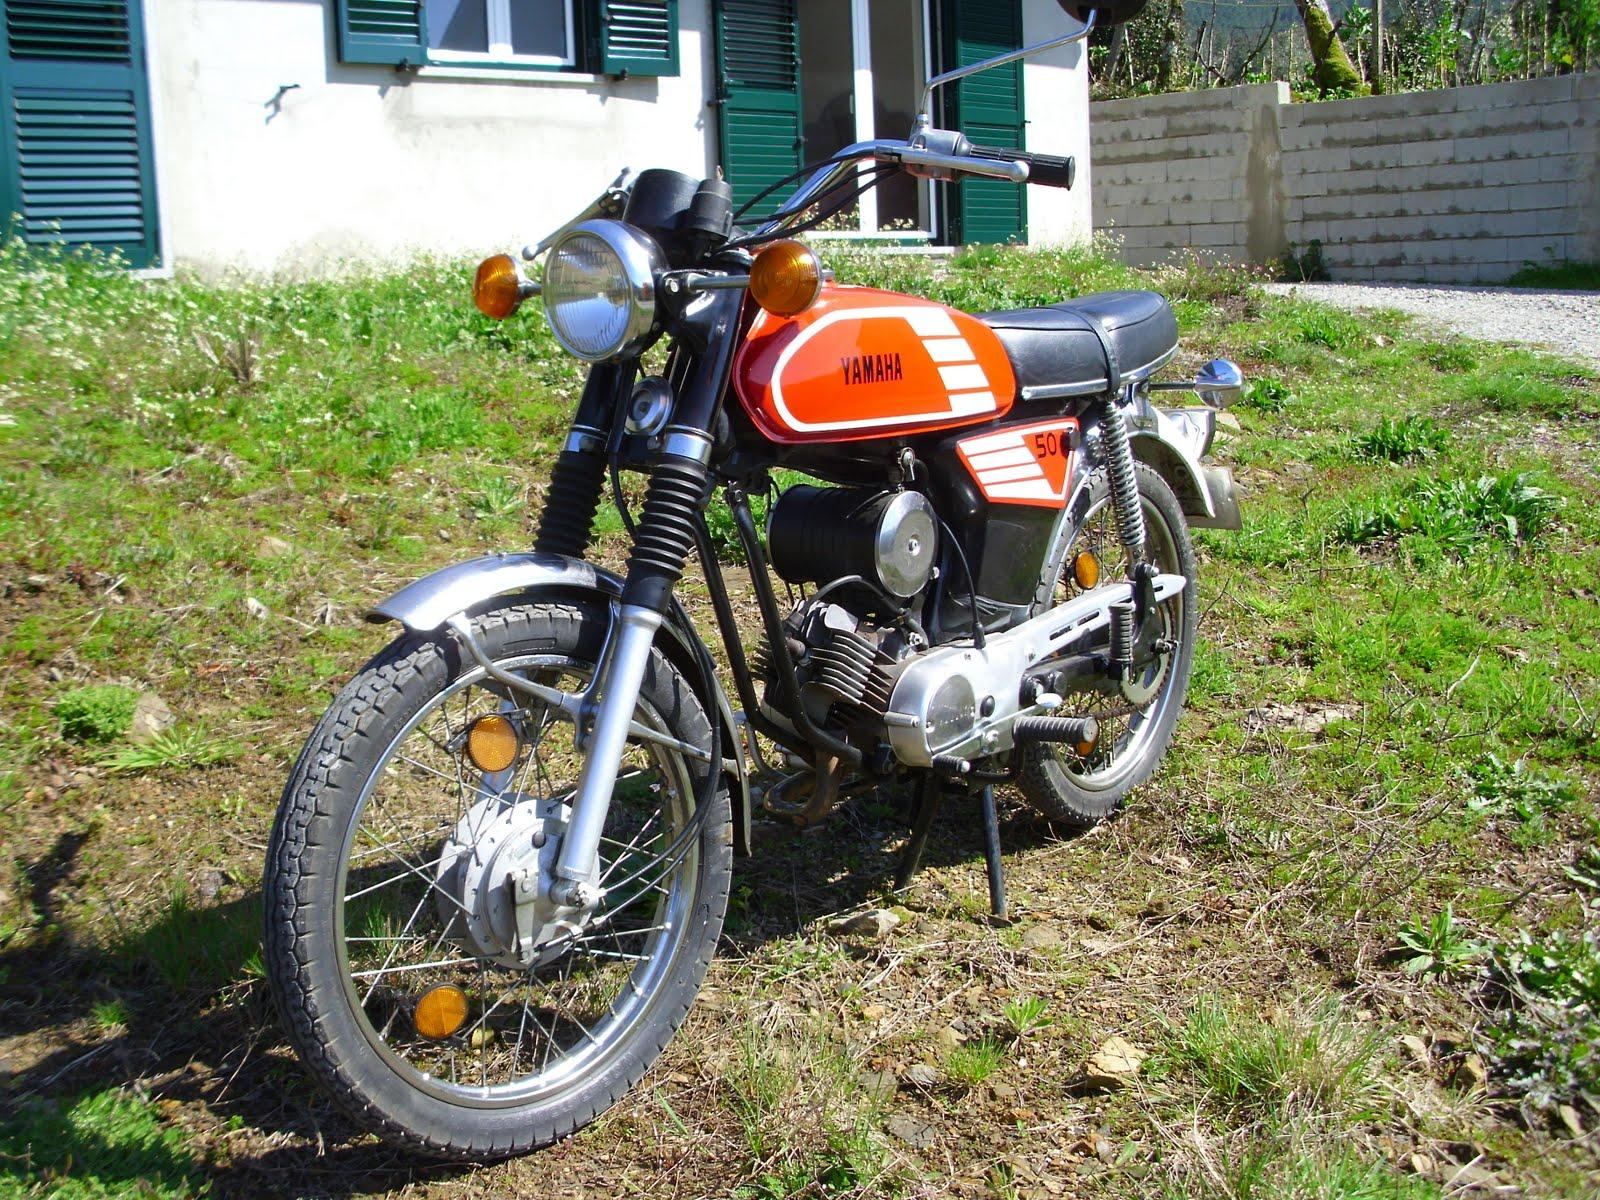 Motas Antigas: A minha garagem Yamaha Fs1